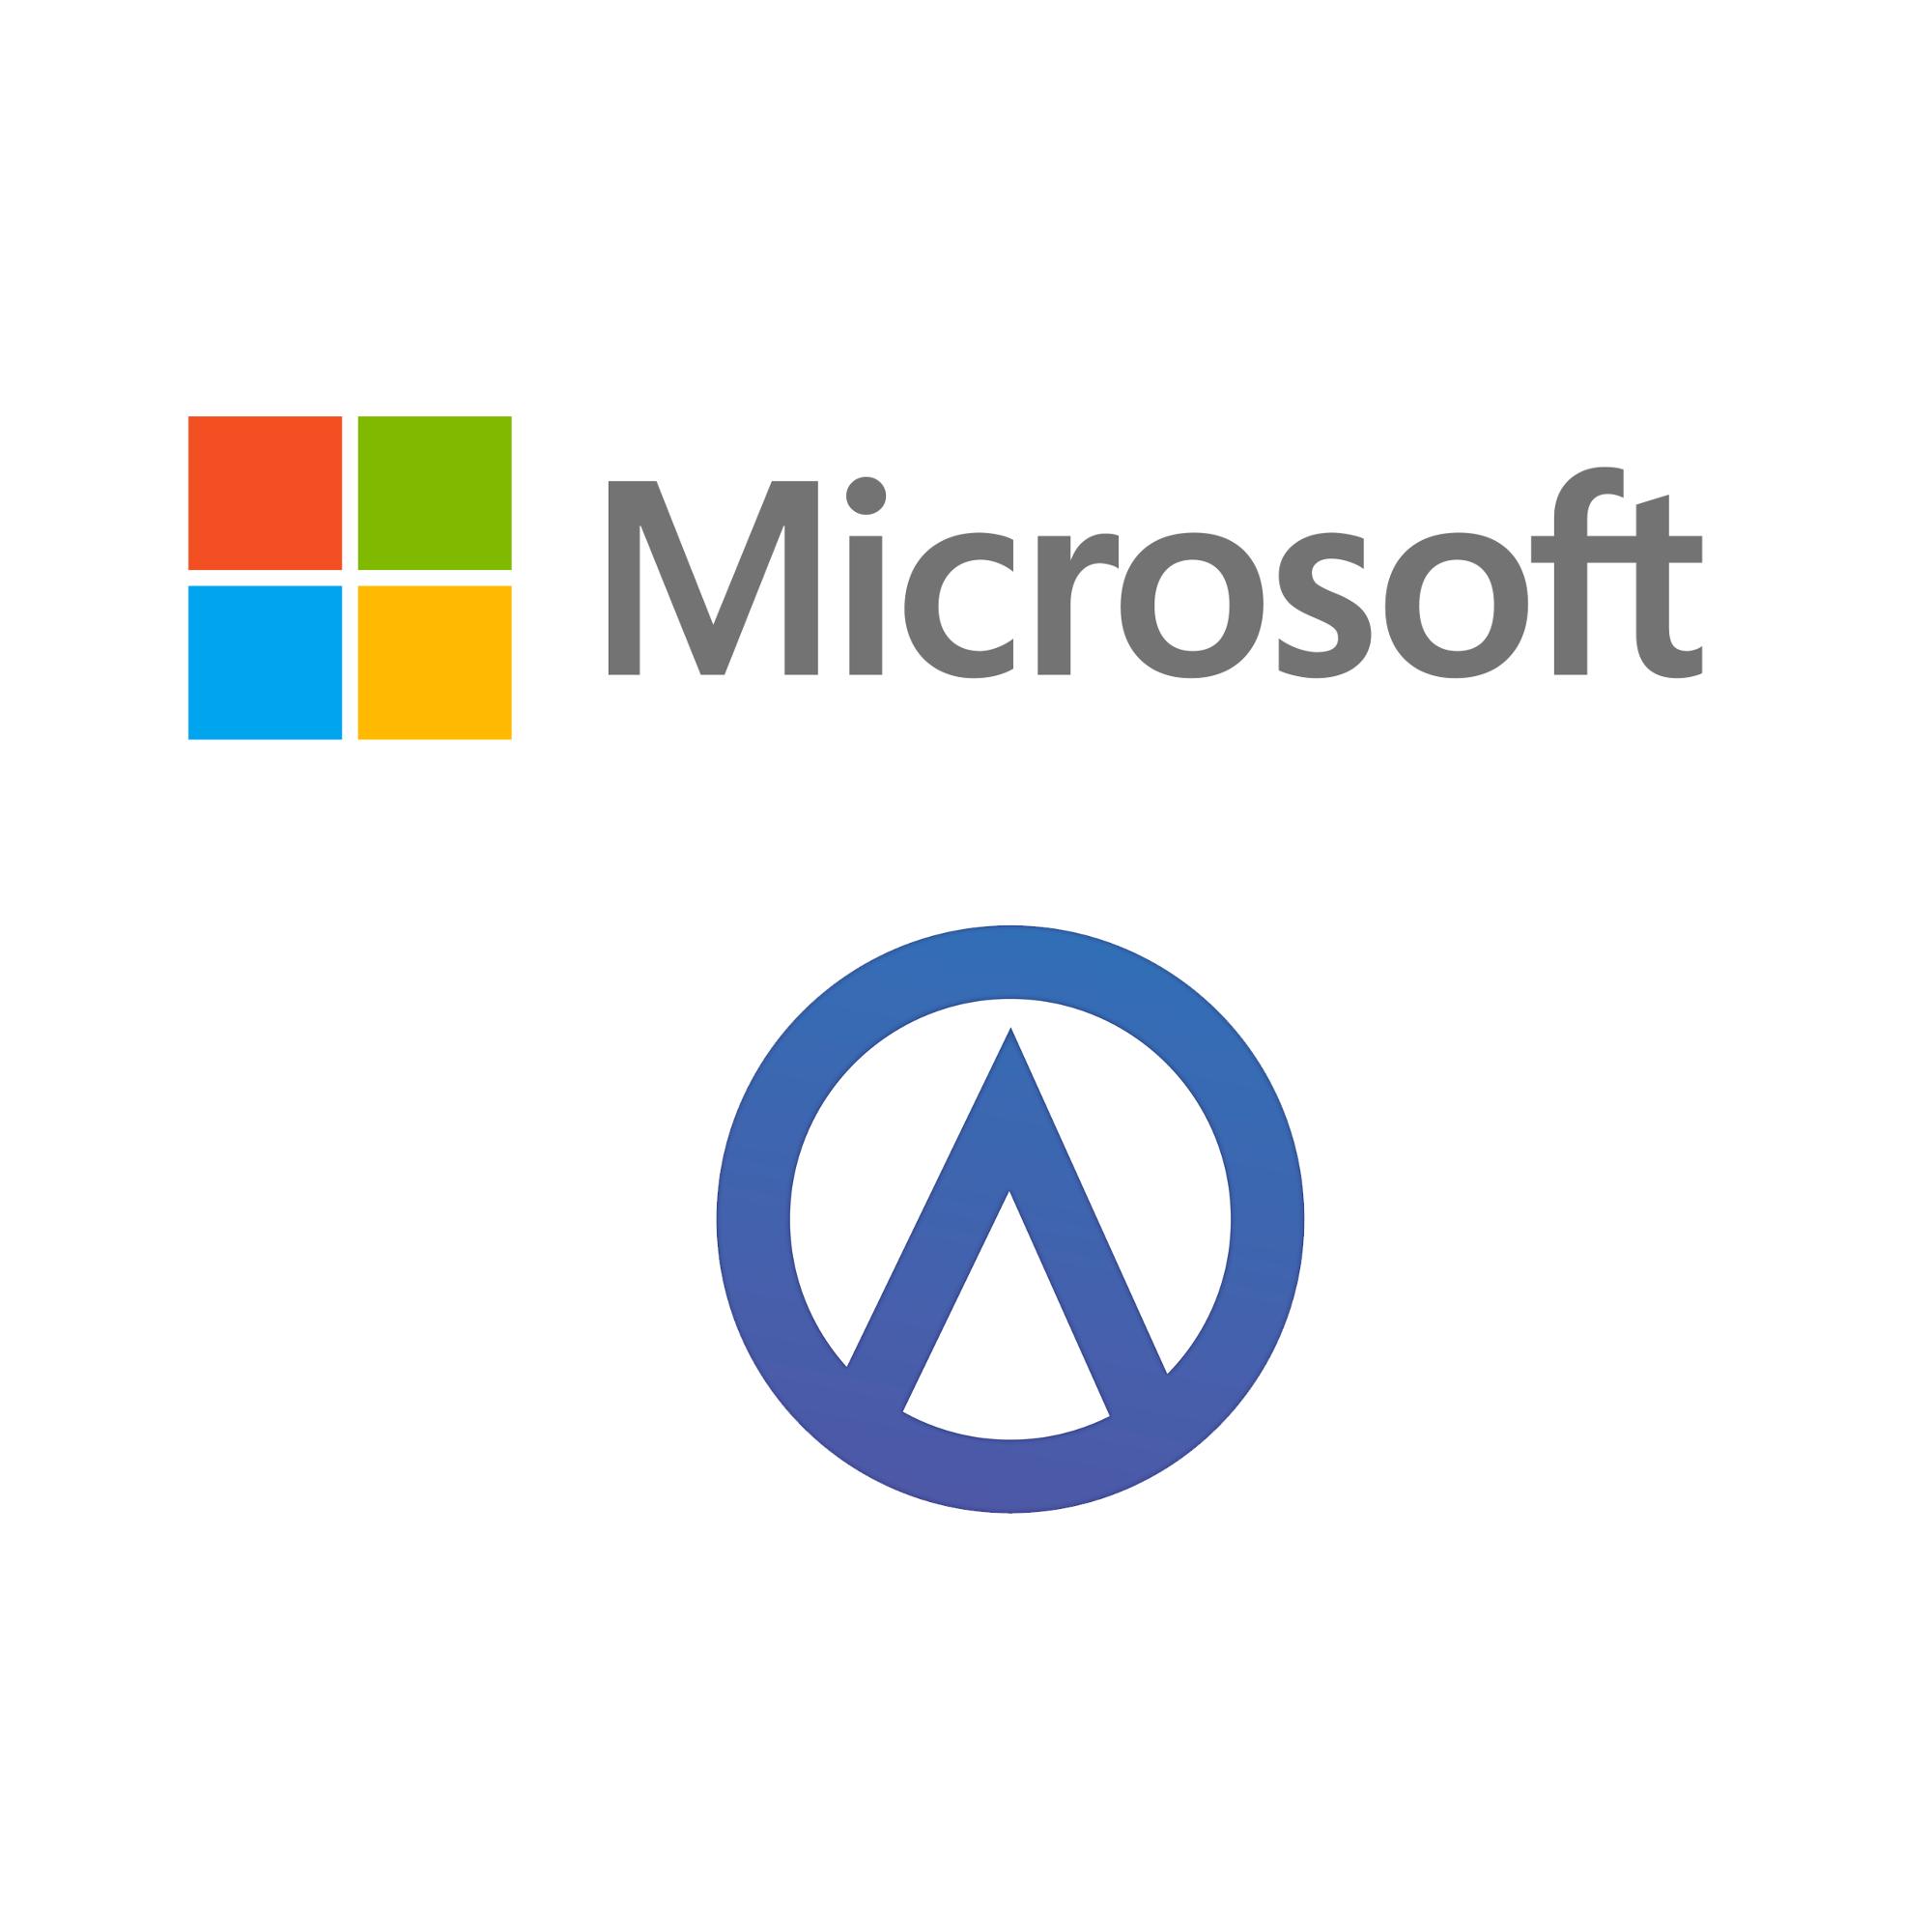 Microsoft koupil startup Acompli